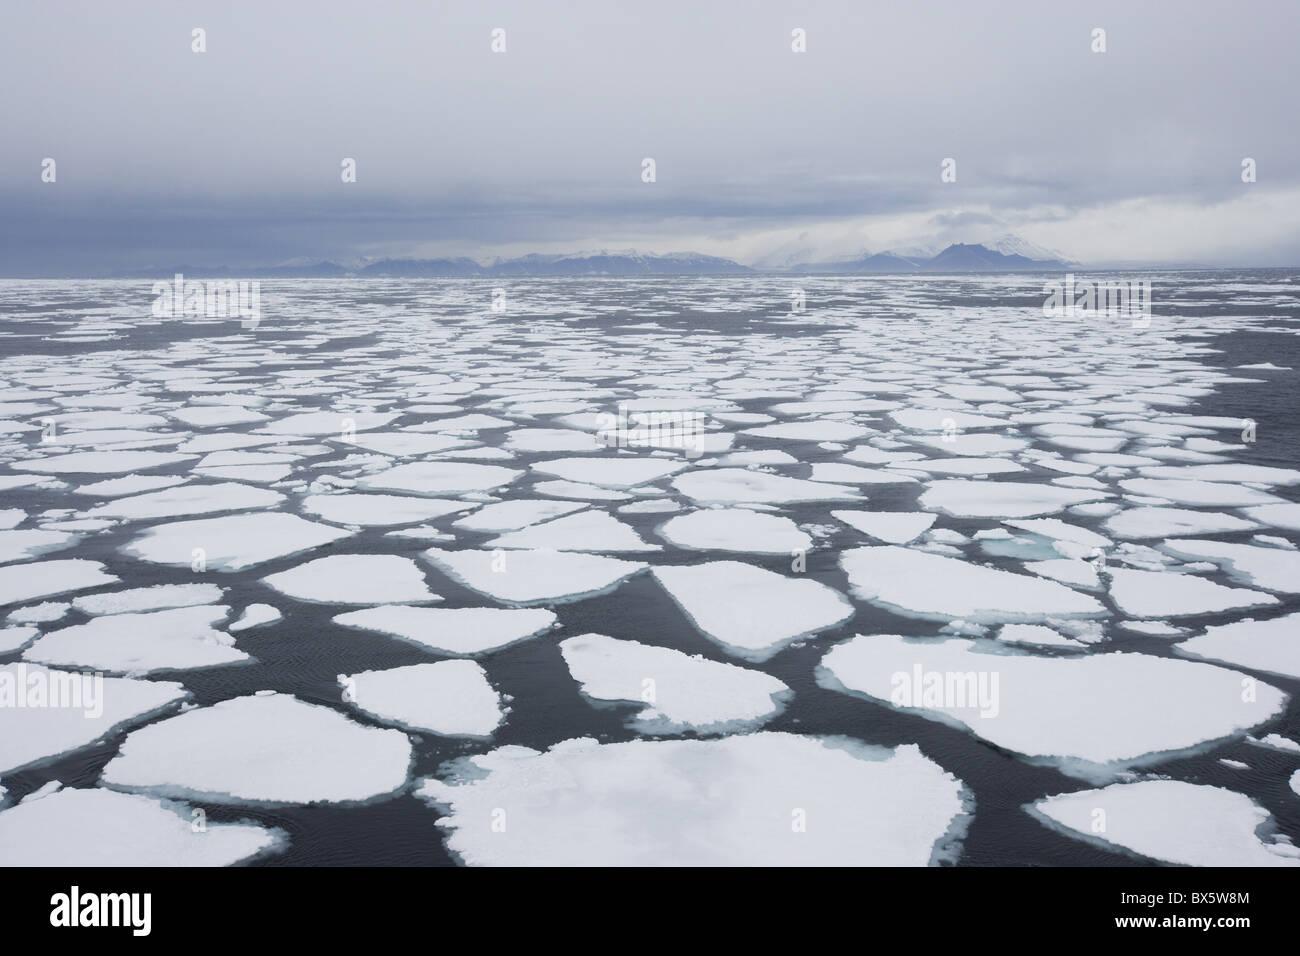 Ice floe, drift ice, Greenland, Arctic, Polar Regions - Stock Image